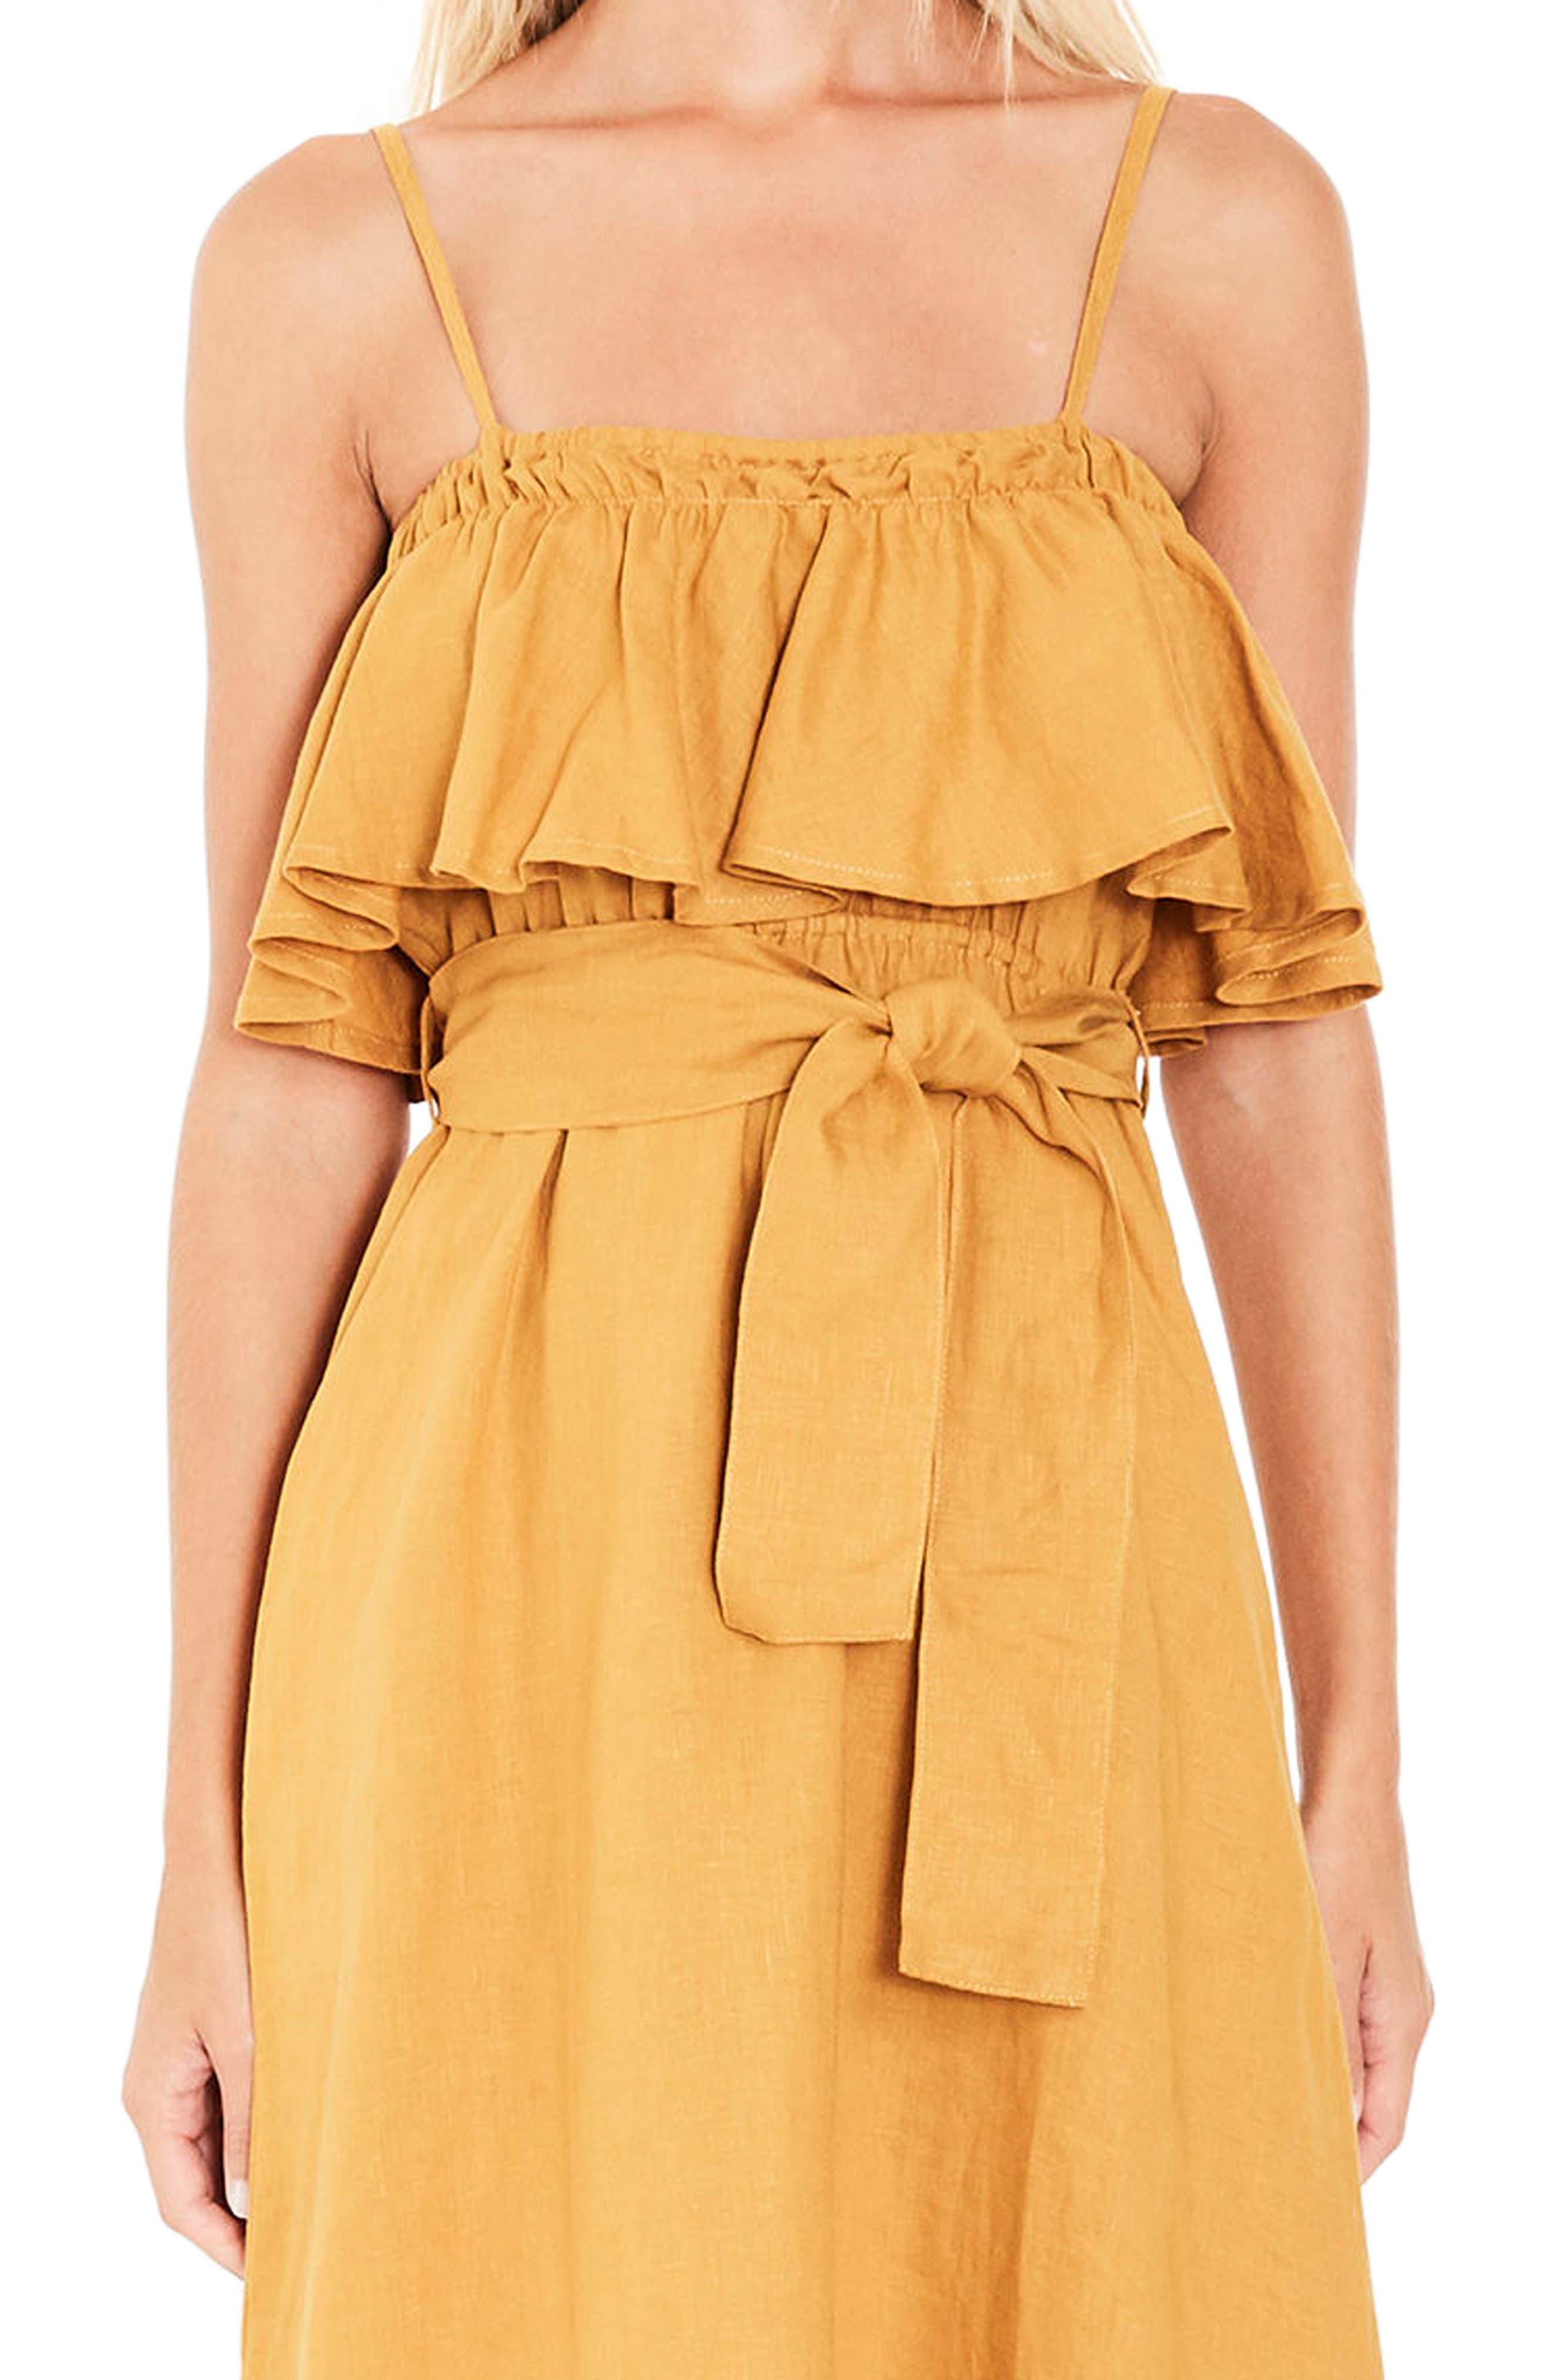 Santo Linen Midi Dress,                             Alternate thumbnail 5, color,                             Plain Marigold